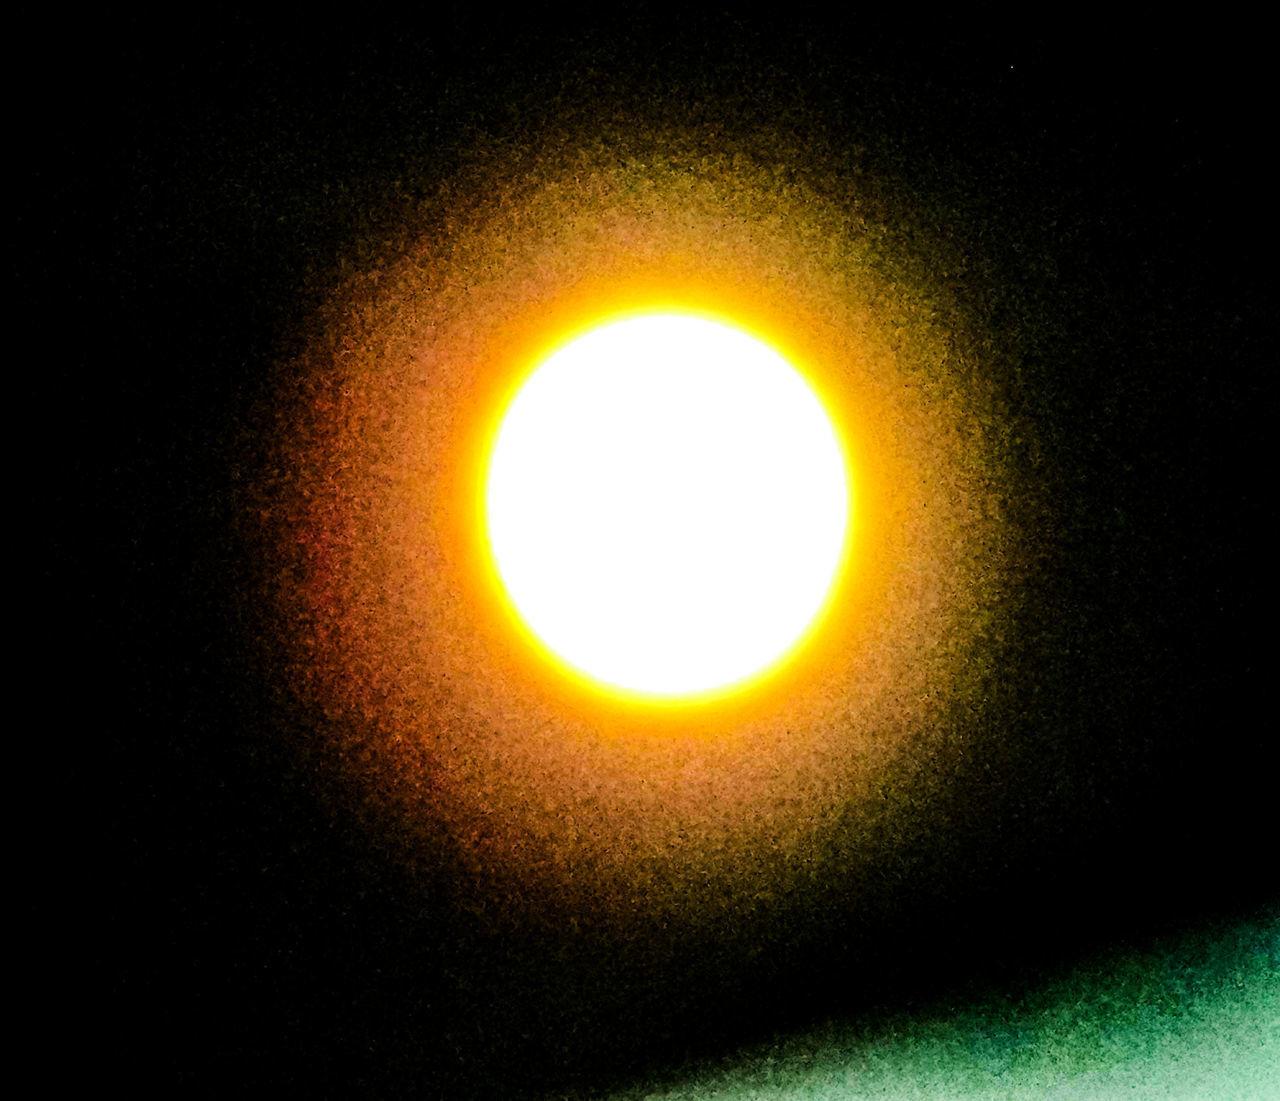 SCENIC VIEW OF ILLUMINATED LIGHT